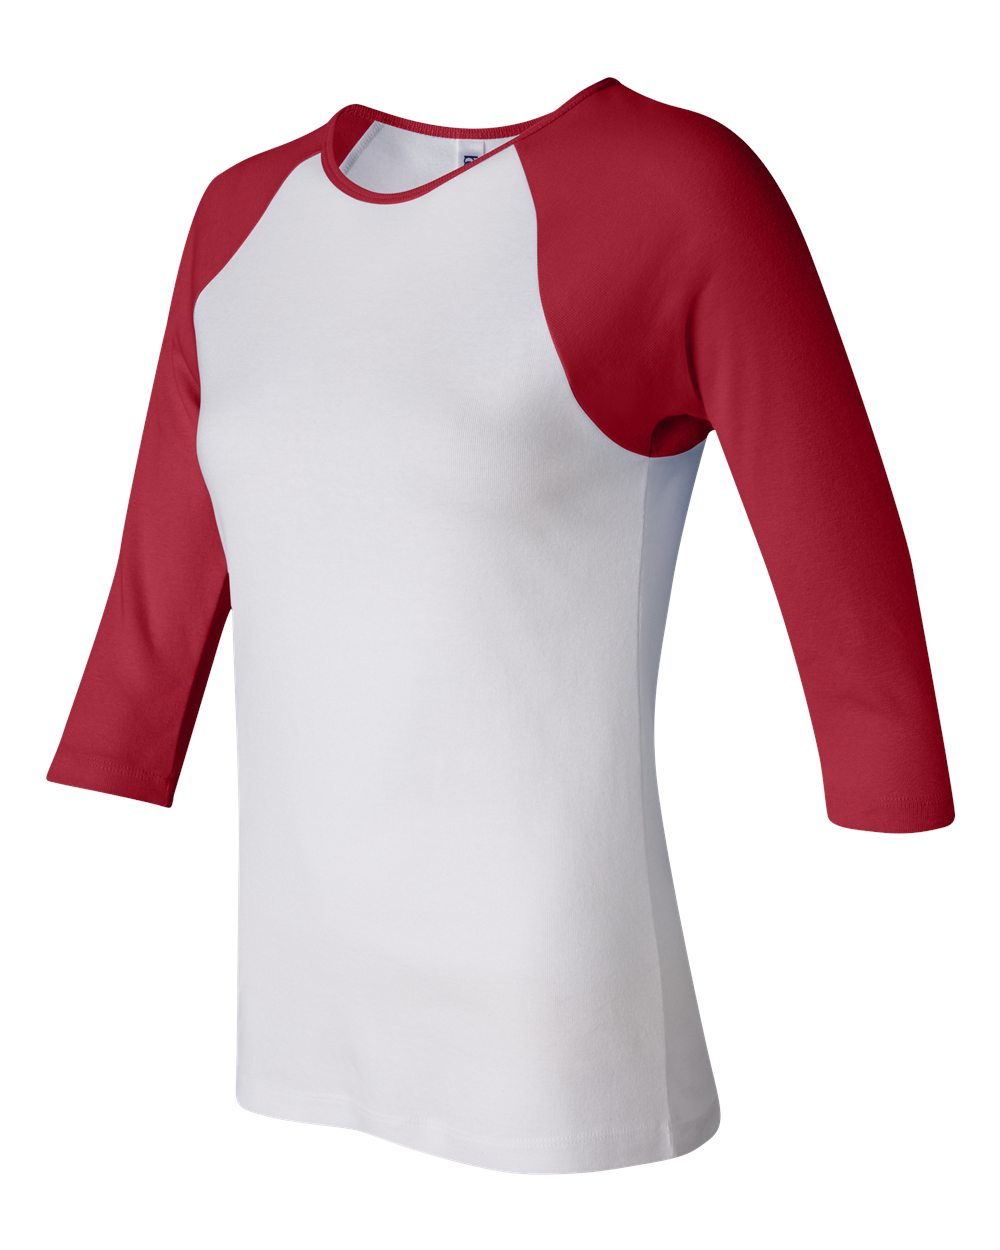 Bella-Canvas-Womens-Stretch-Rib-3-4-Sleeve-Contrast-Raglan-T-Shirt-B2000 thumbnail 25